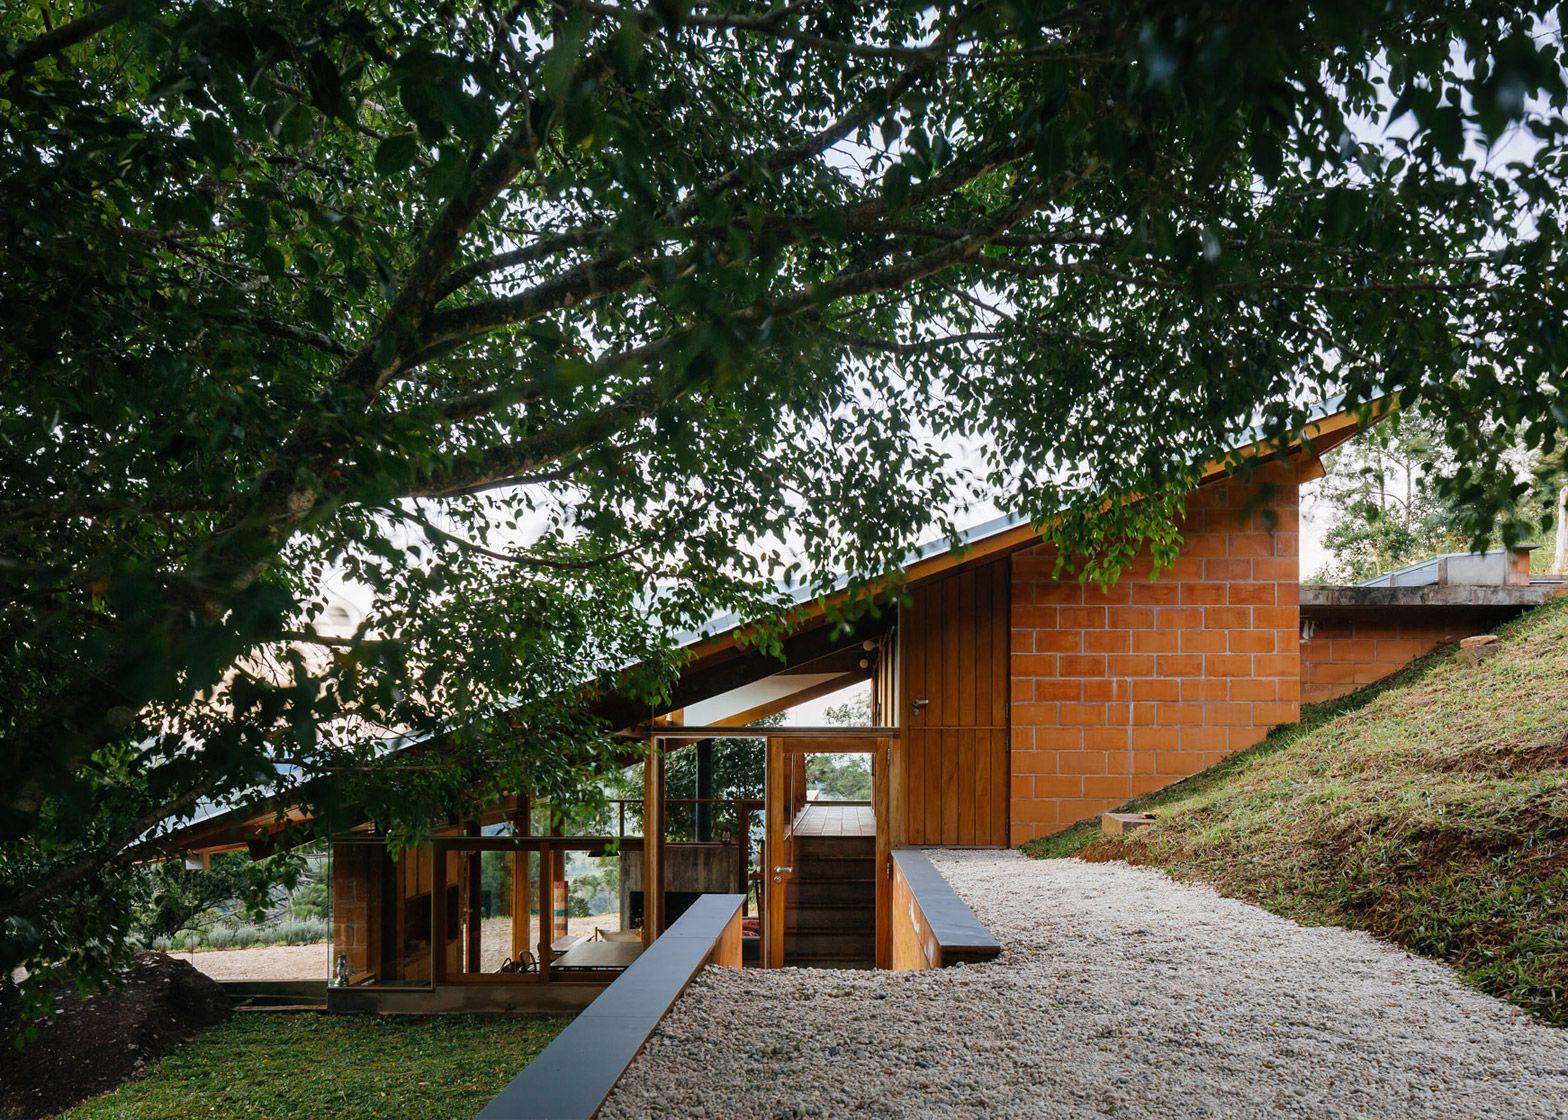 Half slope house steps into a hillside in rural brazil